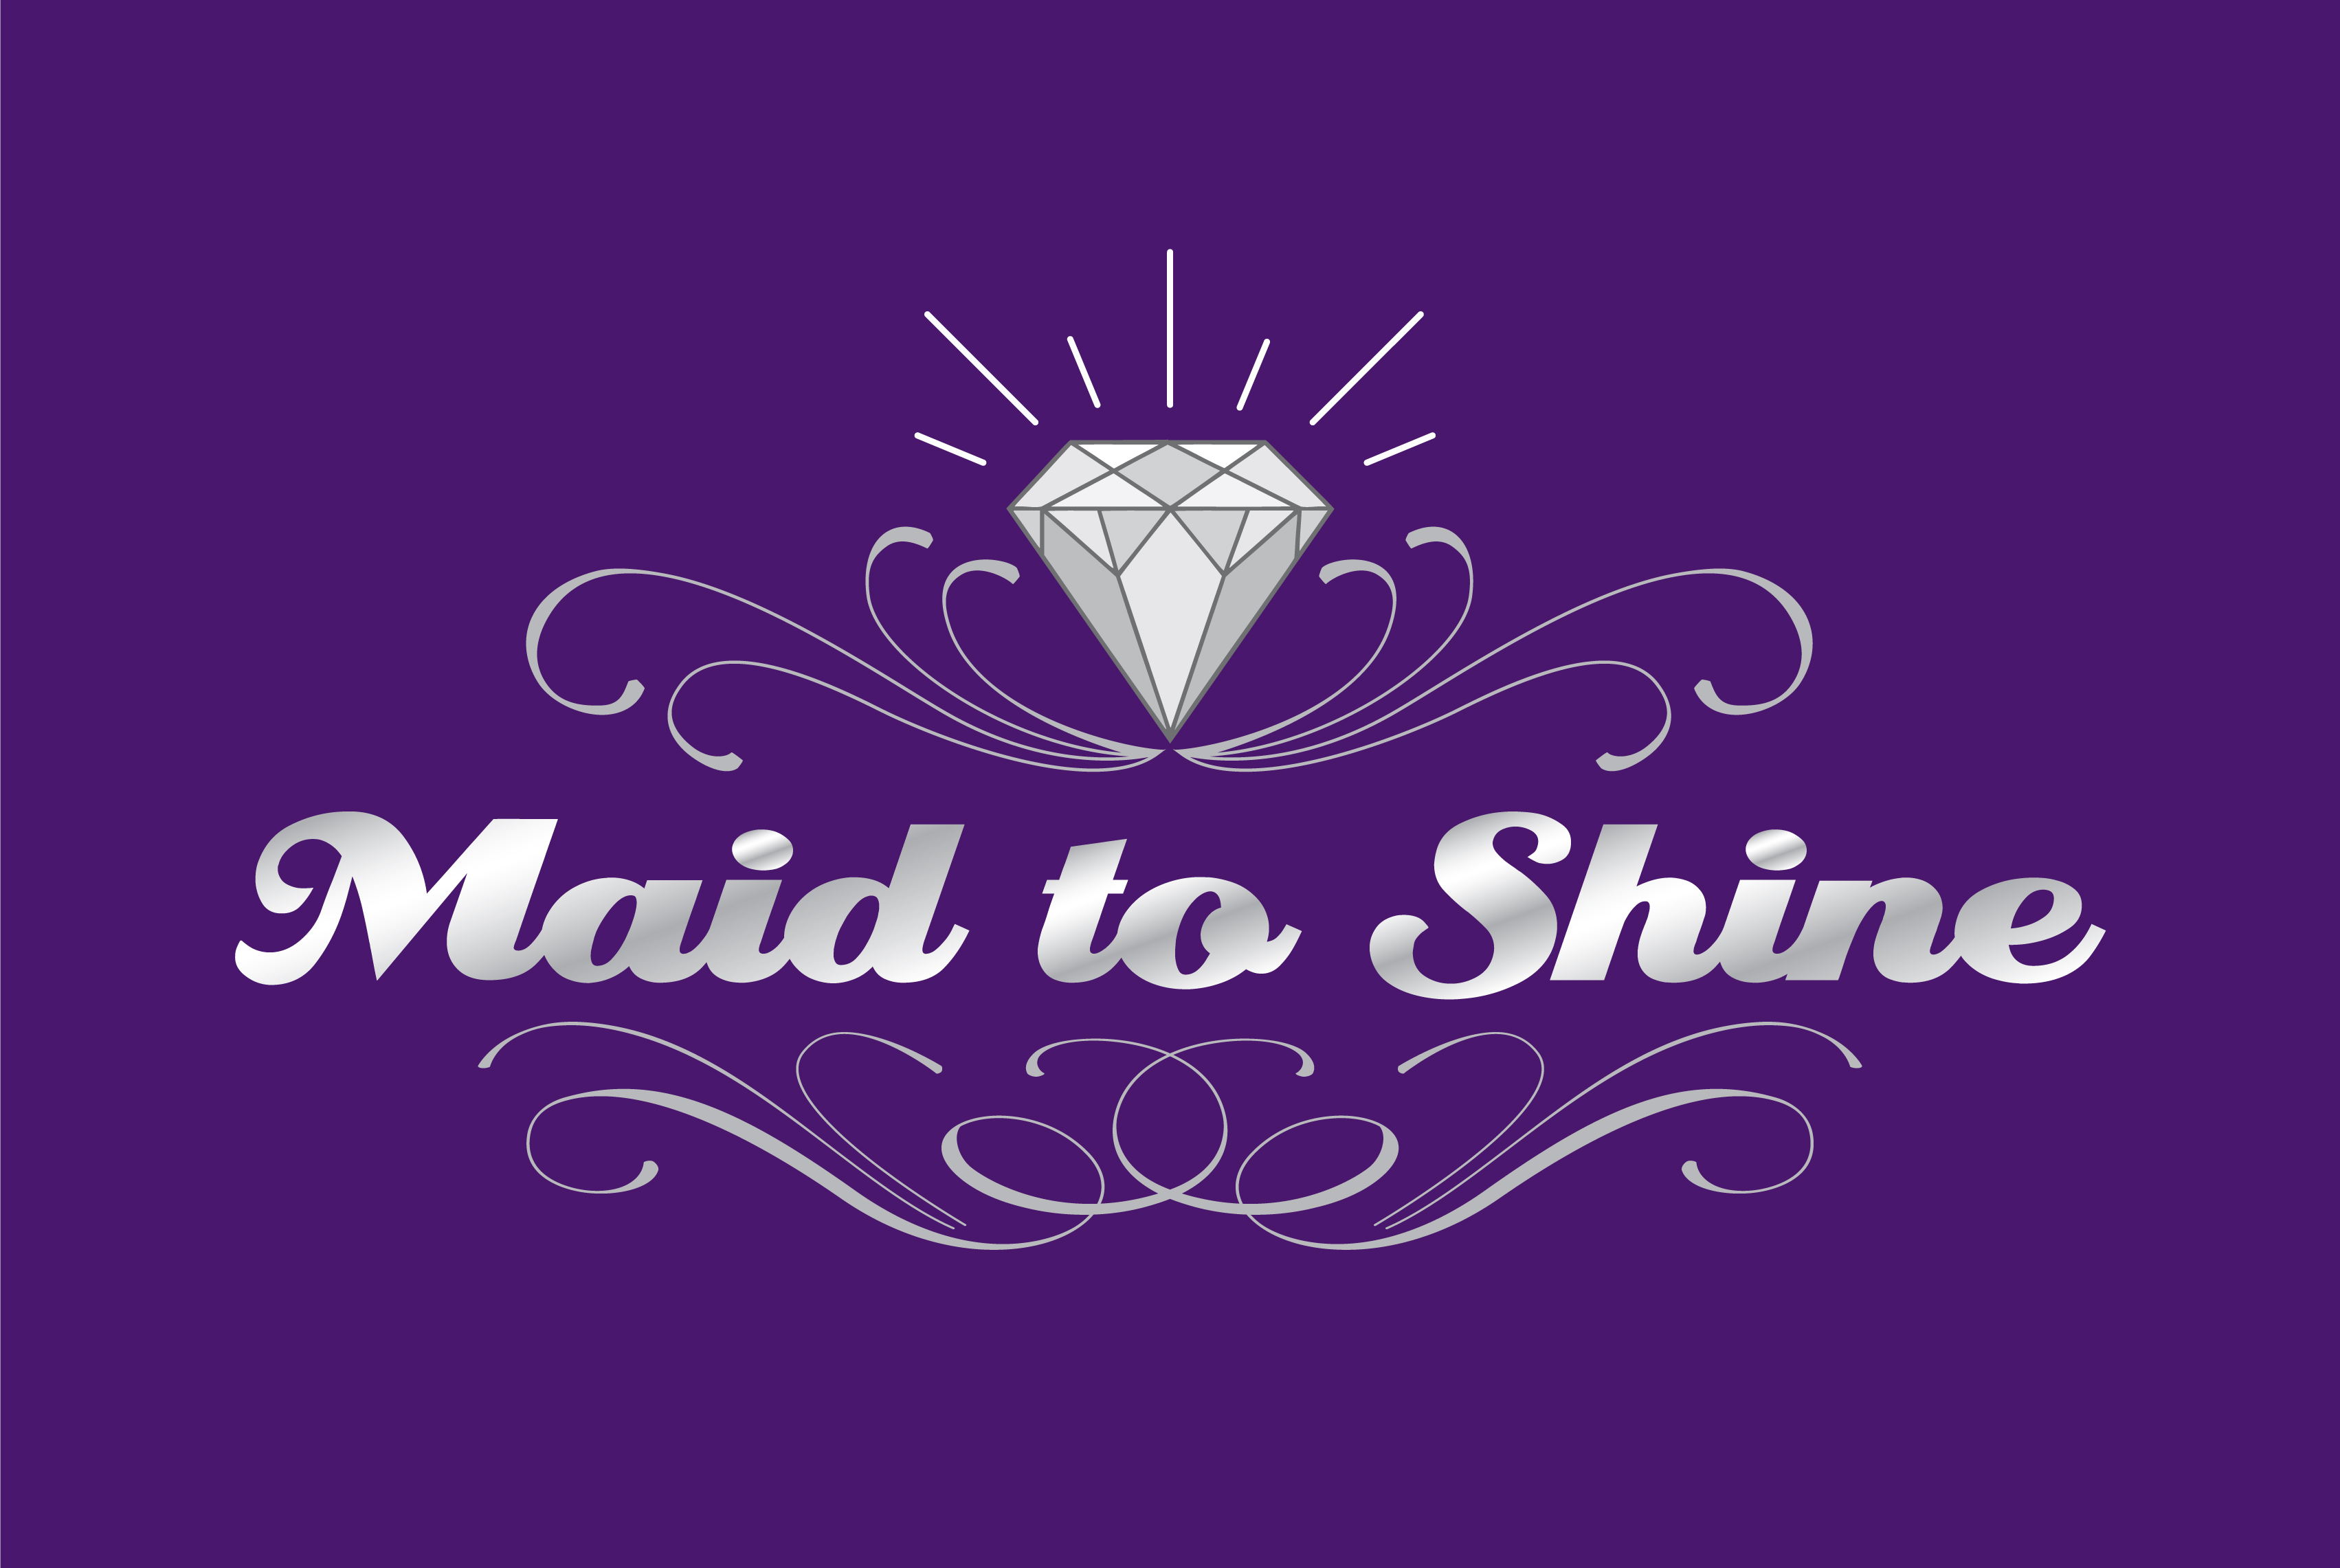 Maid to Shine - Radcliffe, Lancashire  - 01615 072407   ShowMeLocal.com